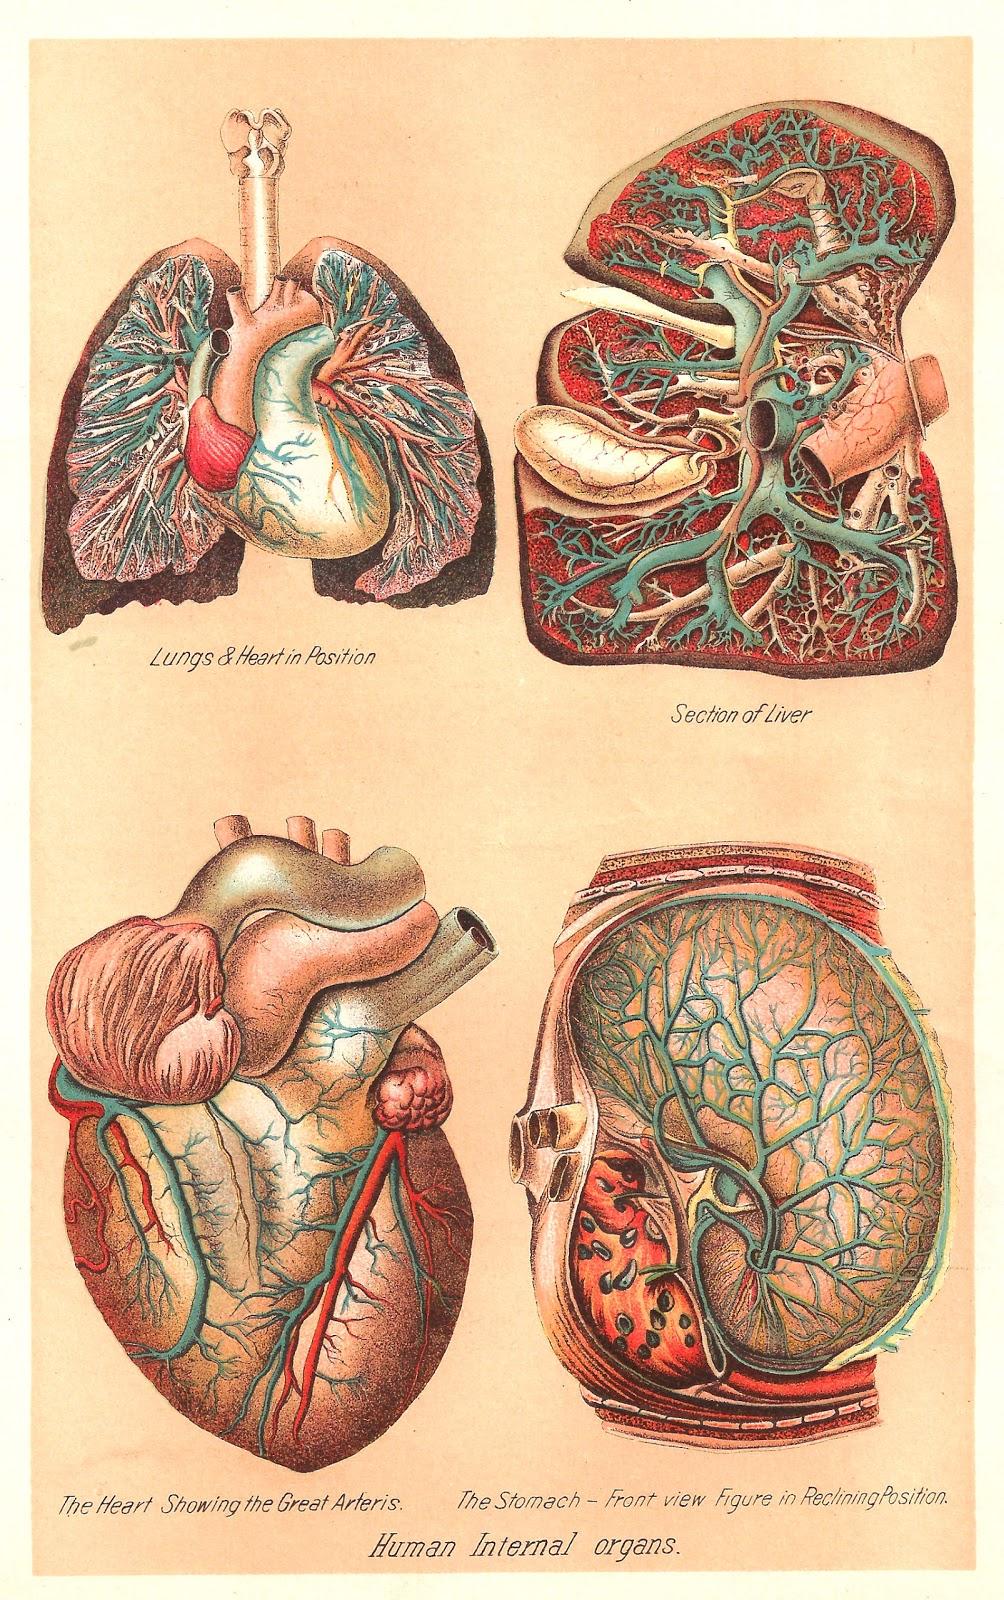 Antique Images  Vintage Medical Clip Art  Human Body Graphic Of 4 Human Internal Organs